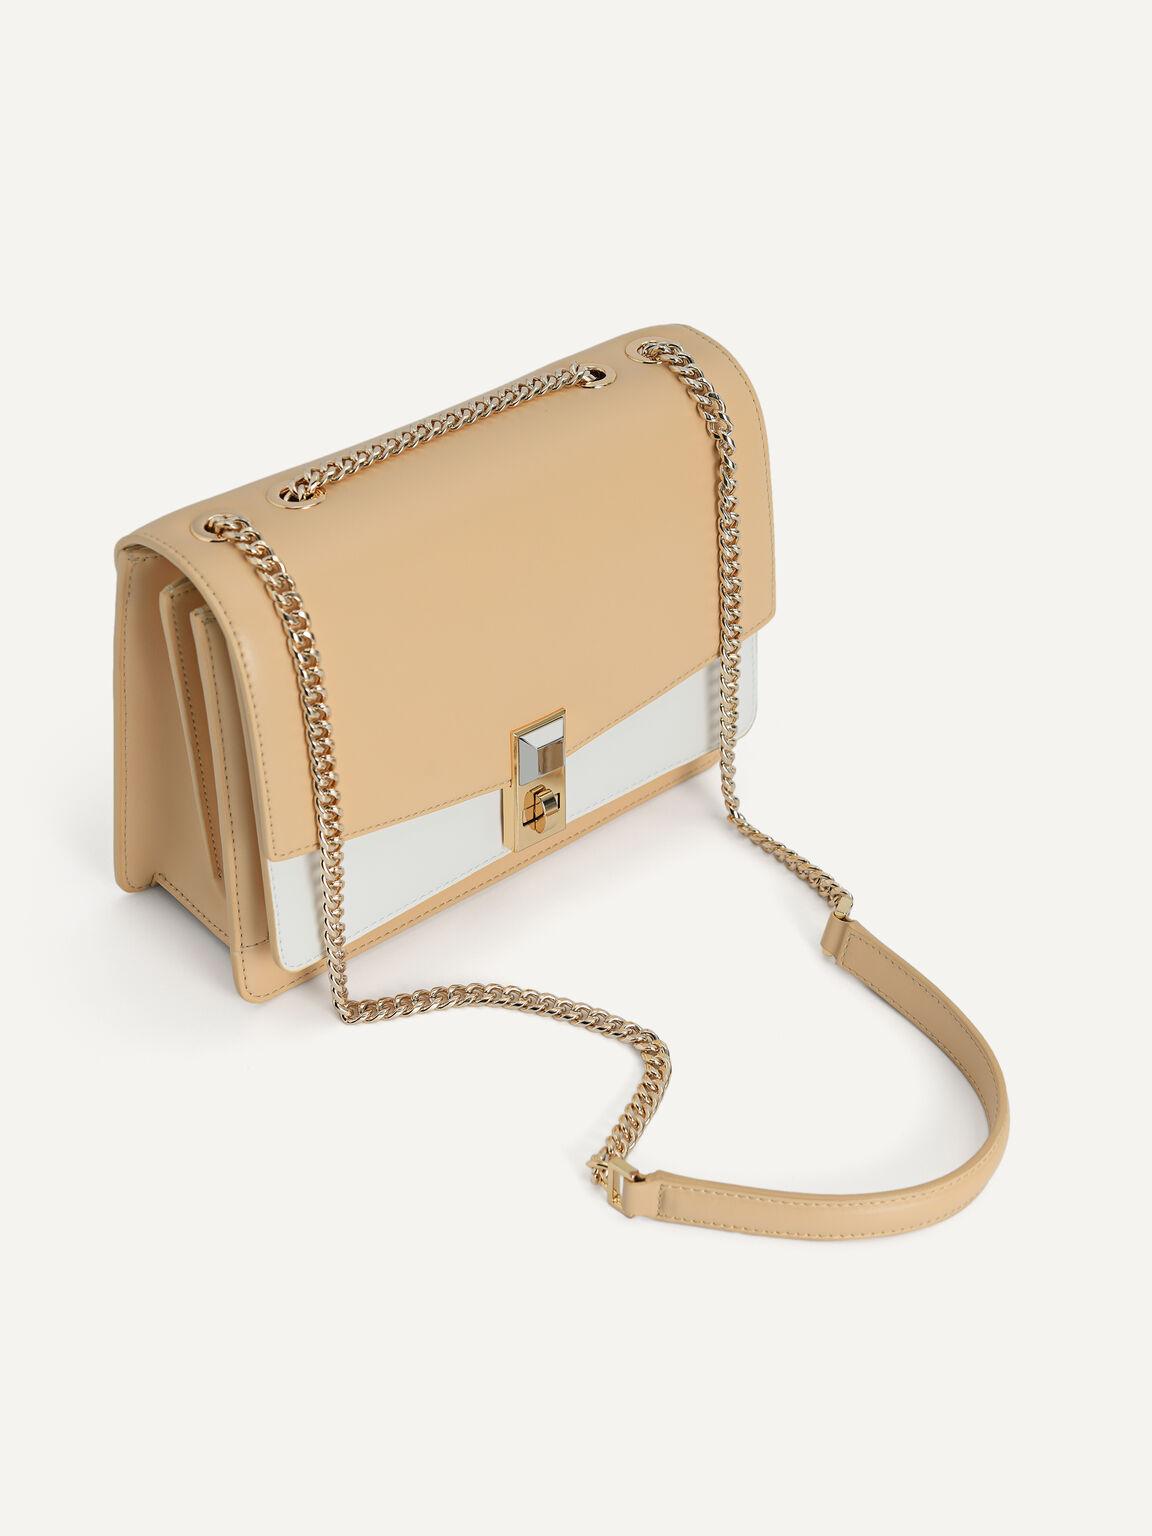 Duo-Toned Tiered Shoulder Bag, Multi, hi-res